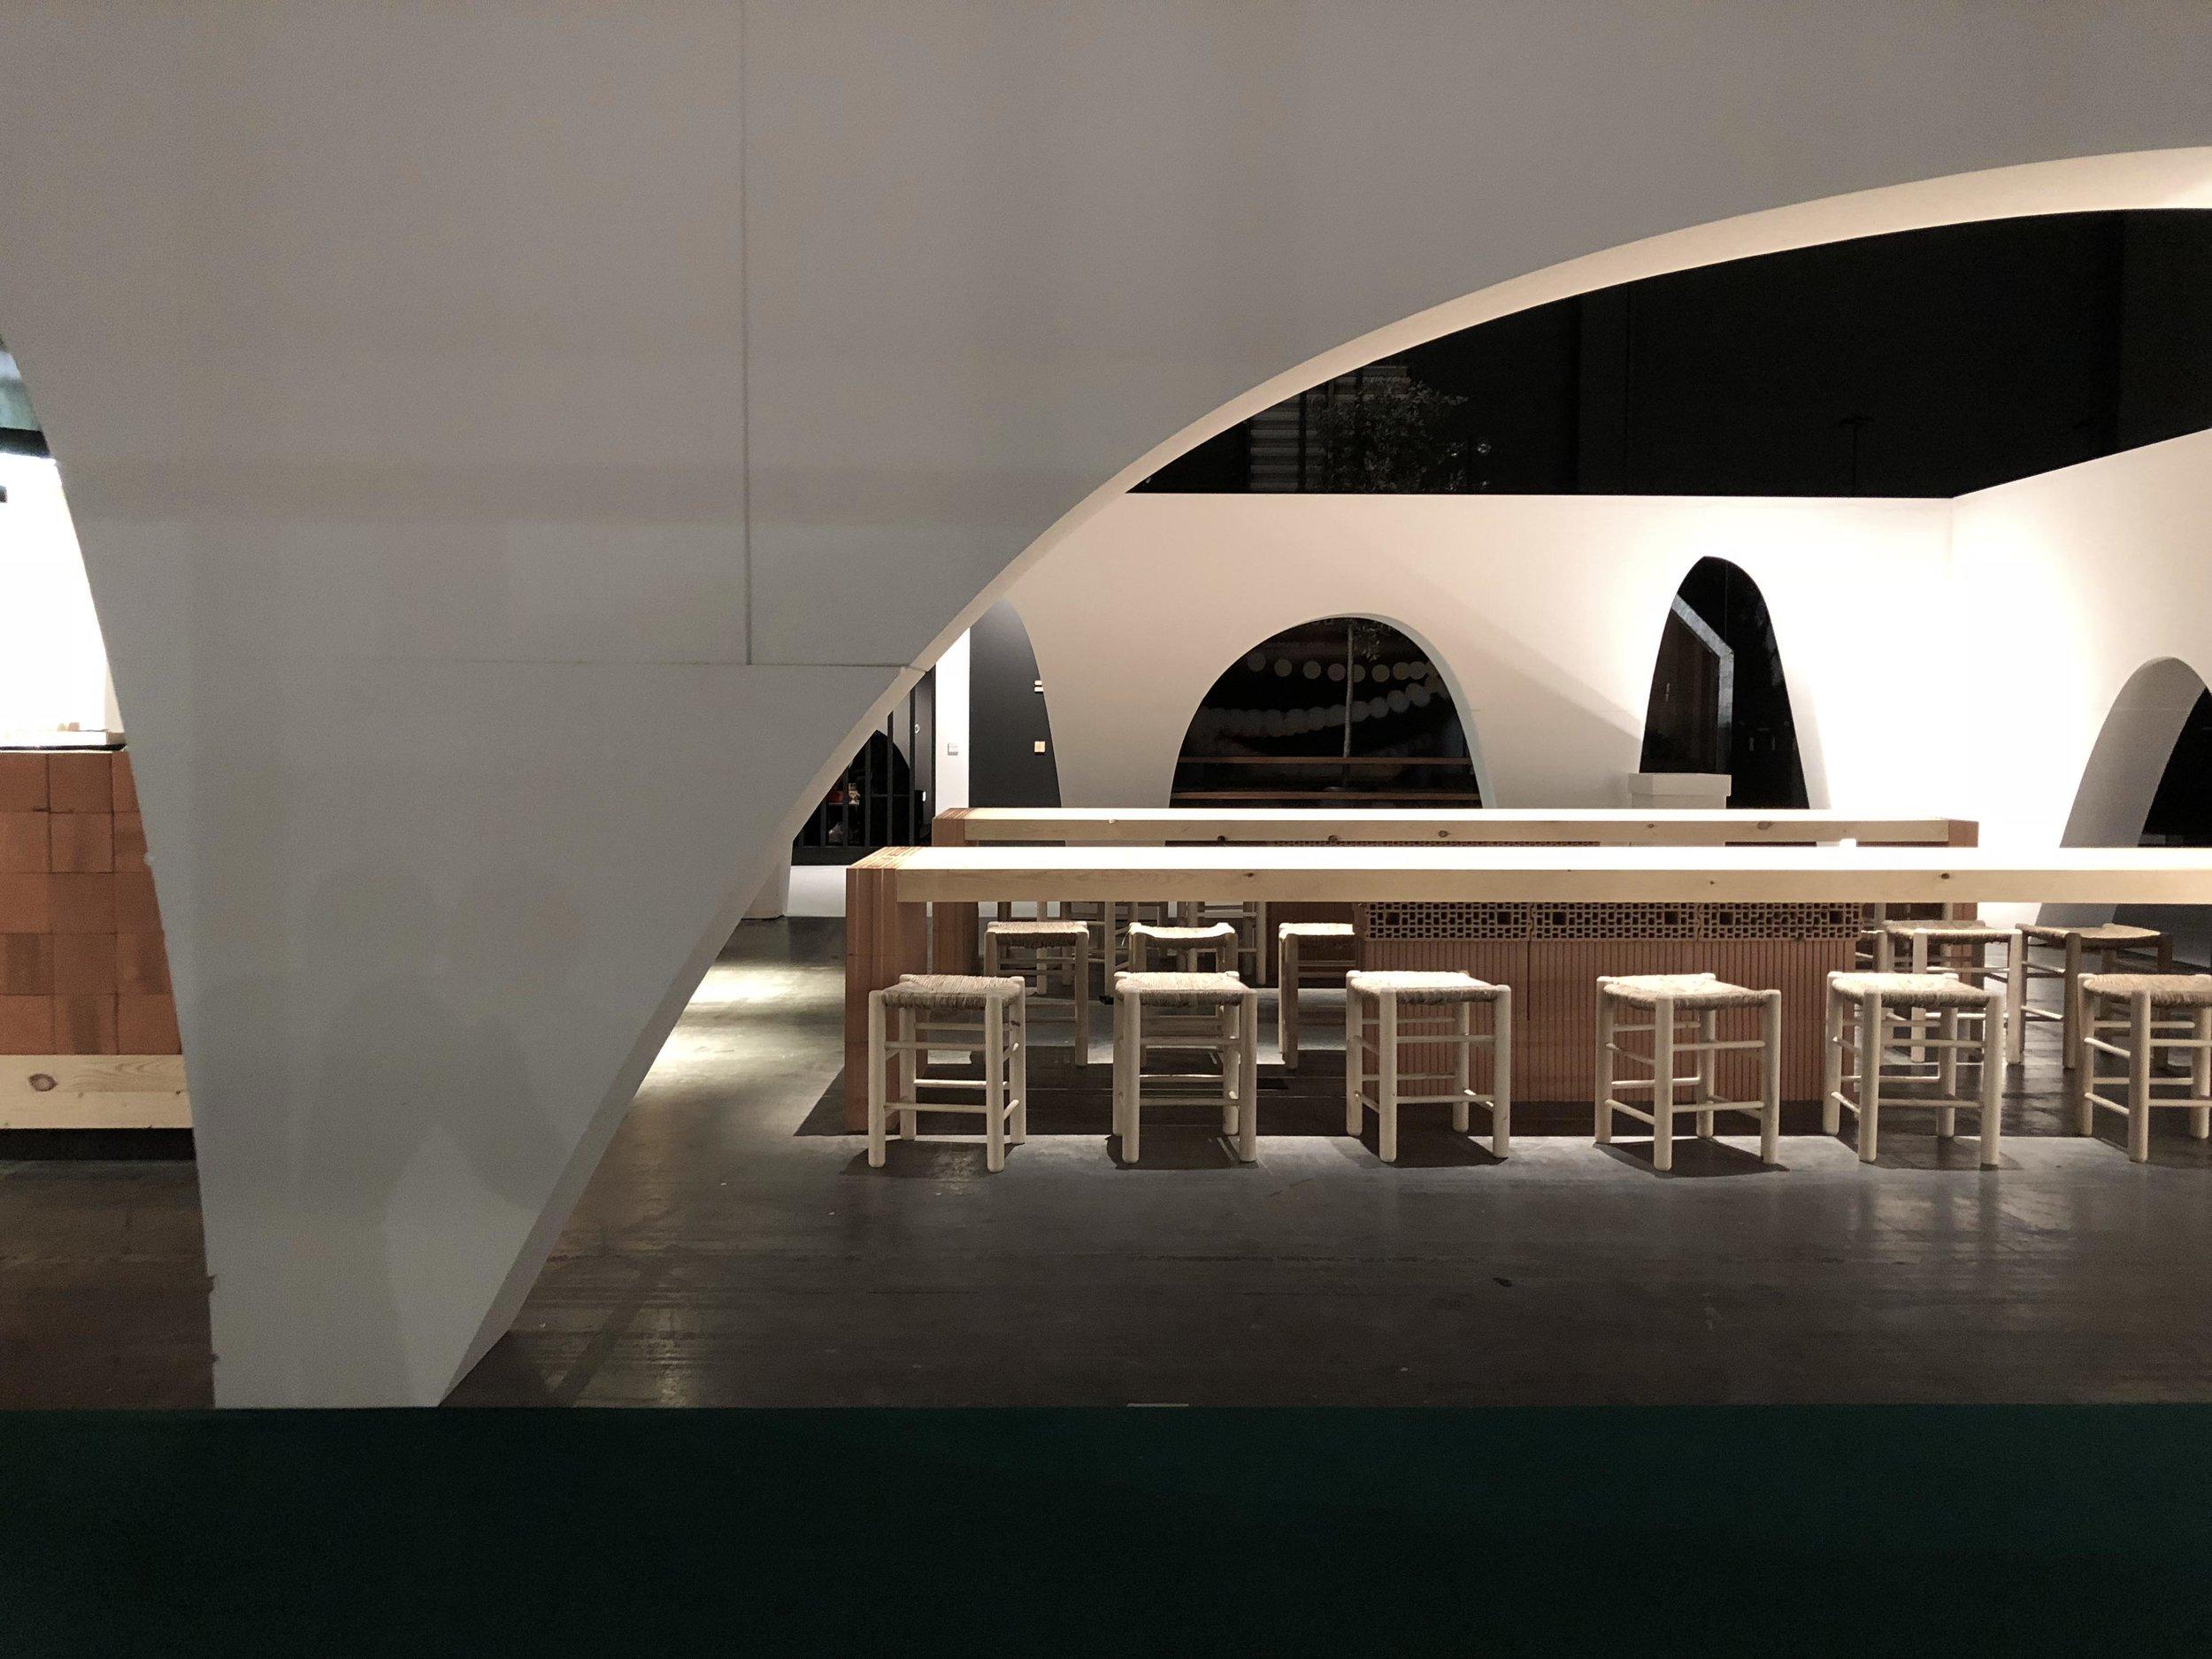 Raams-Architecture-Design-Studio-Geofood-Interieur-Biennale-Kortrijk-Belgium-design-award-restaurant-installation-exhibition-11s.jpg